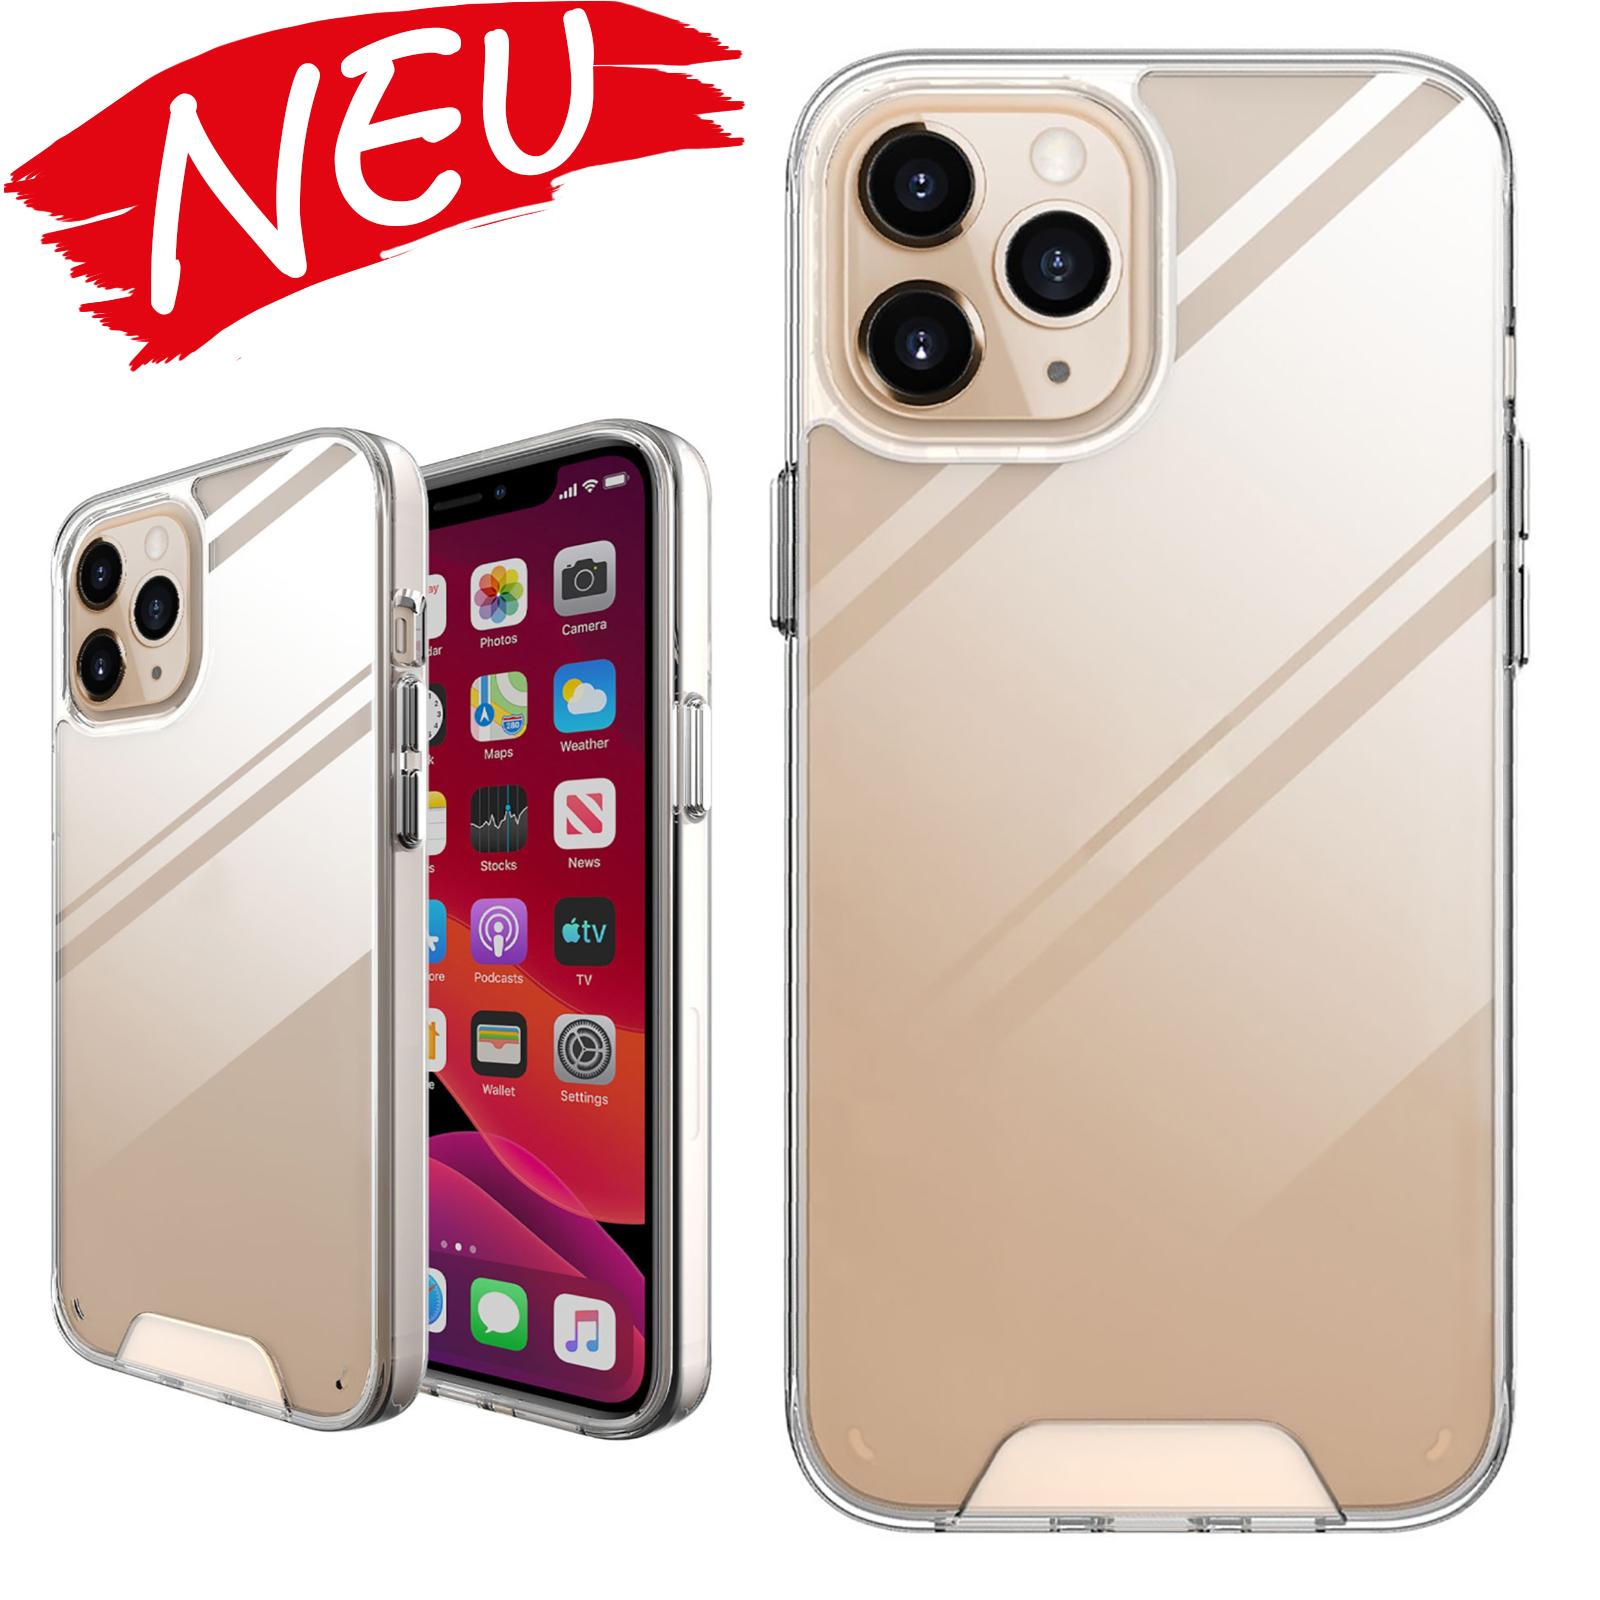 Für iPhone 12 mini Kratzfestes TPU + Acryl Weltraum-Etui Schutzhülle (Transparent)